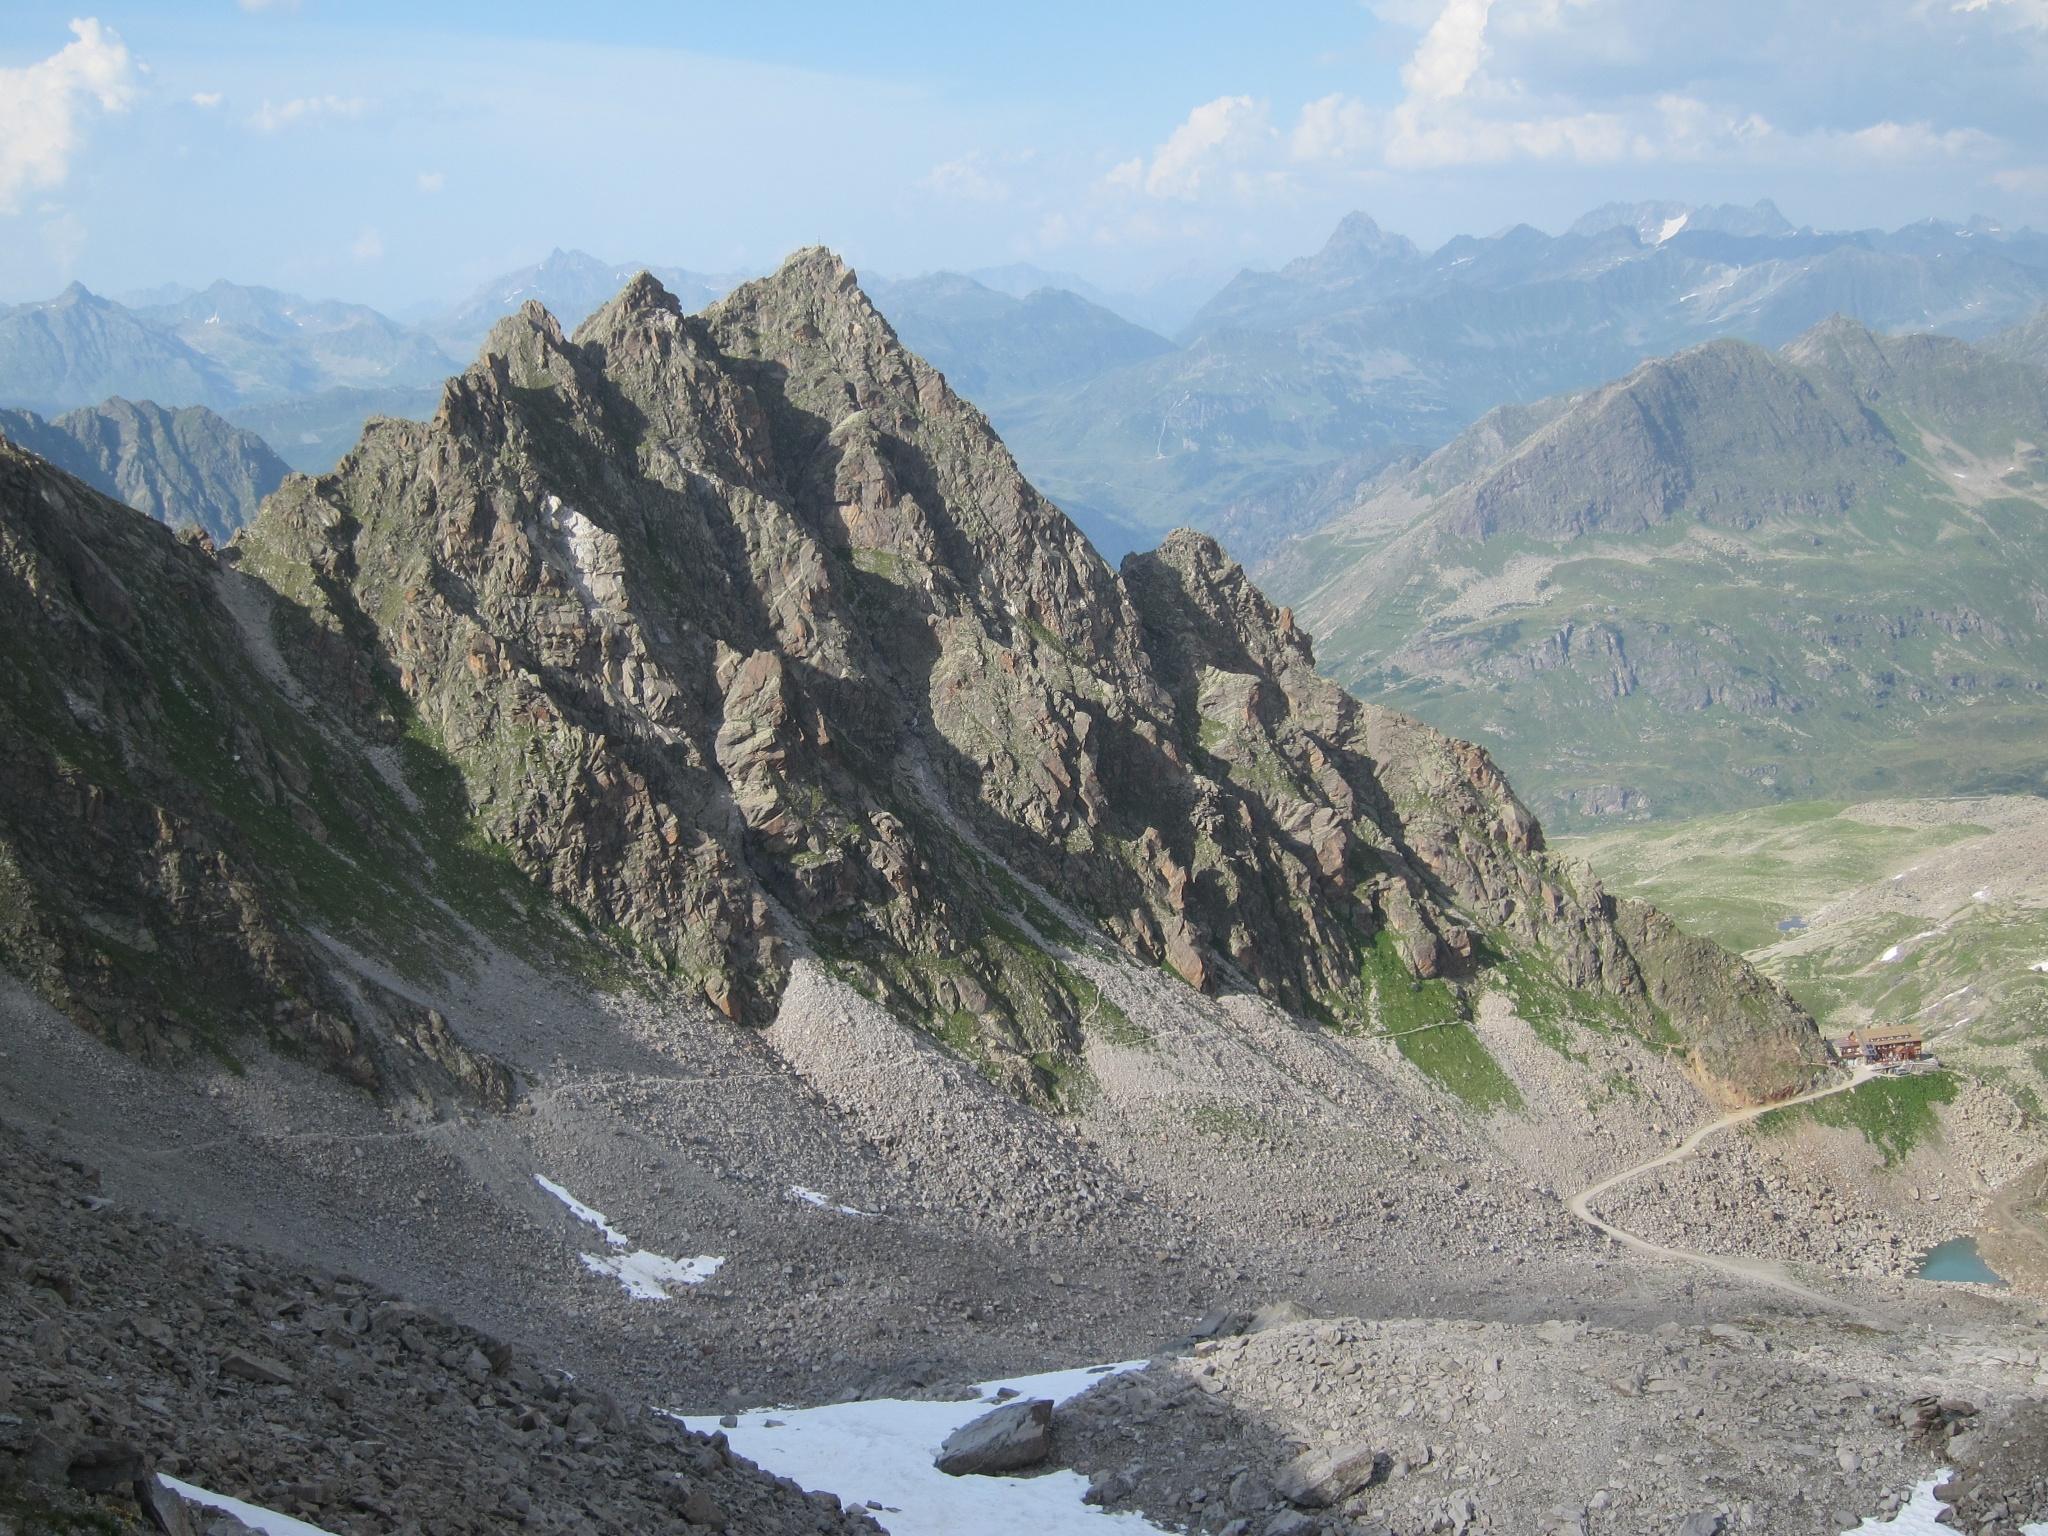 Klettersteig Vorarlberg : Saula klettersteig t o u r e n s p